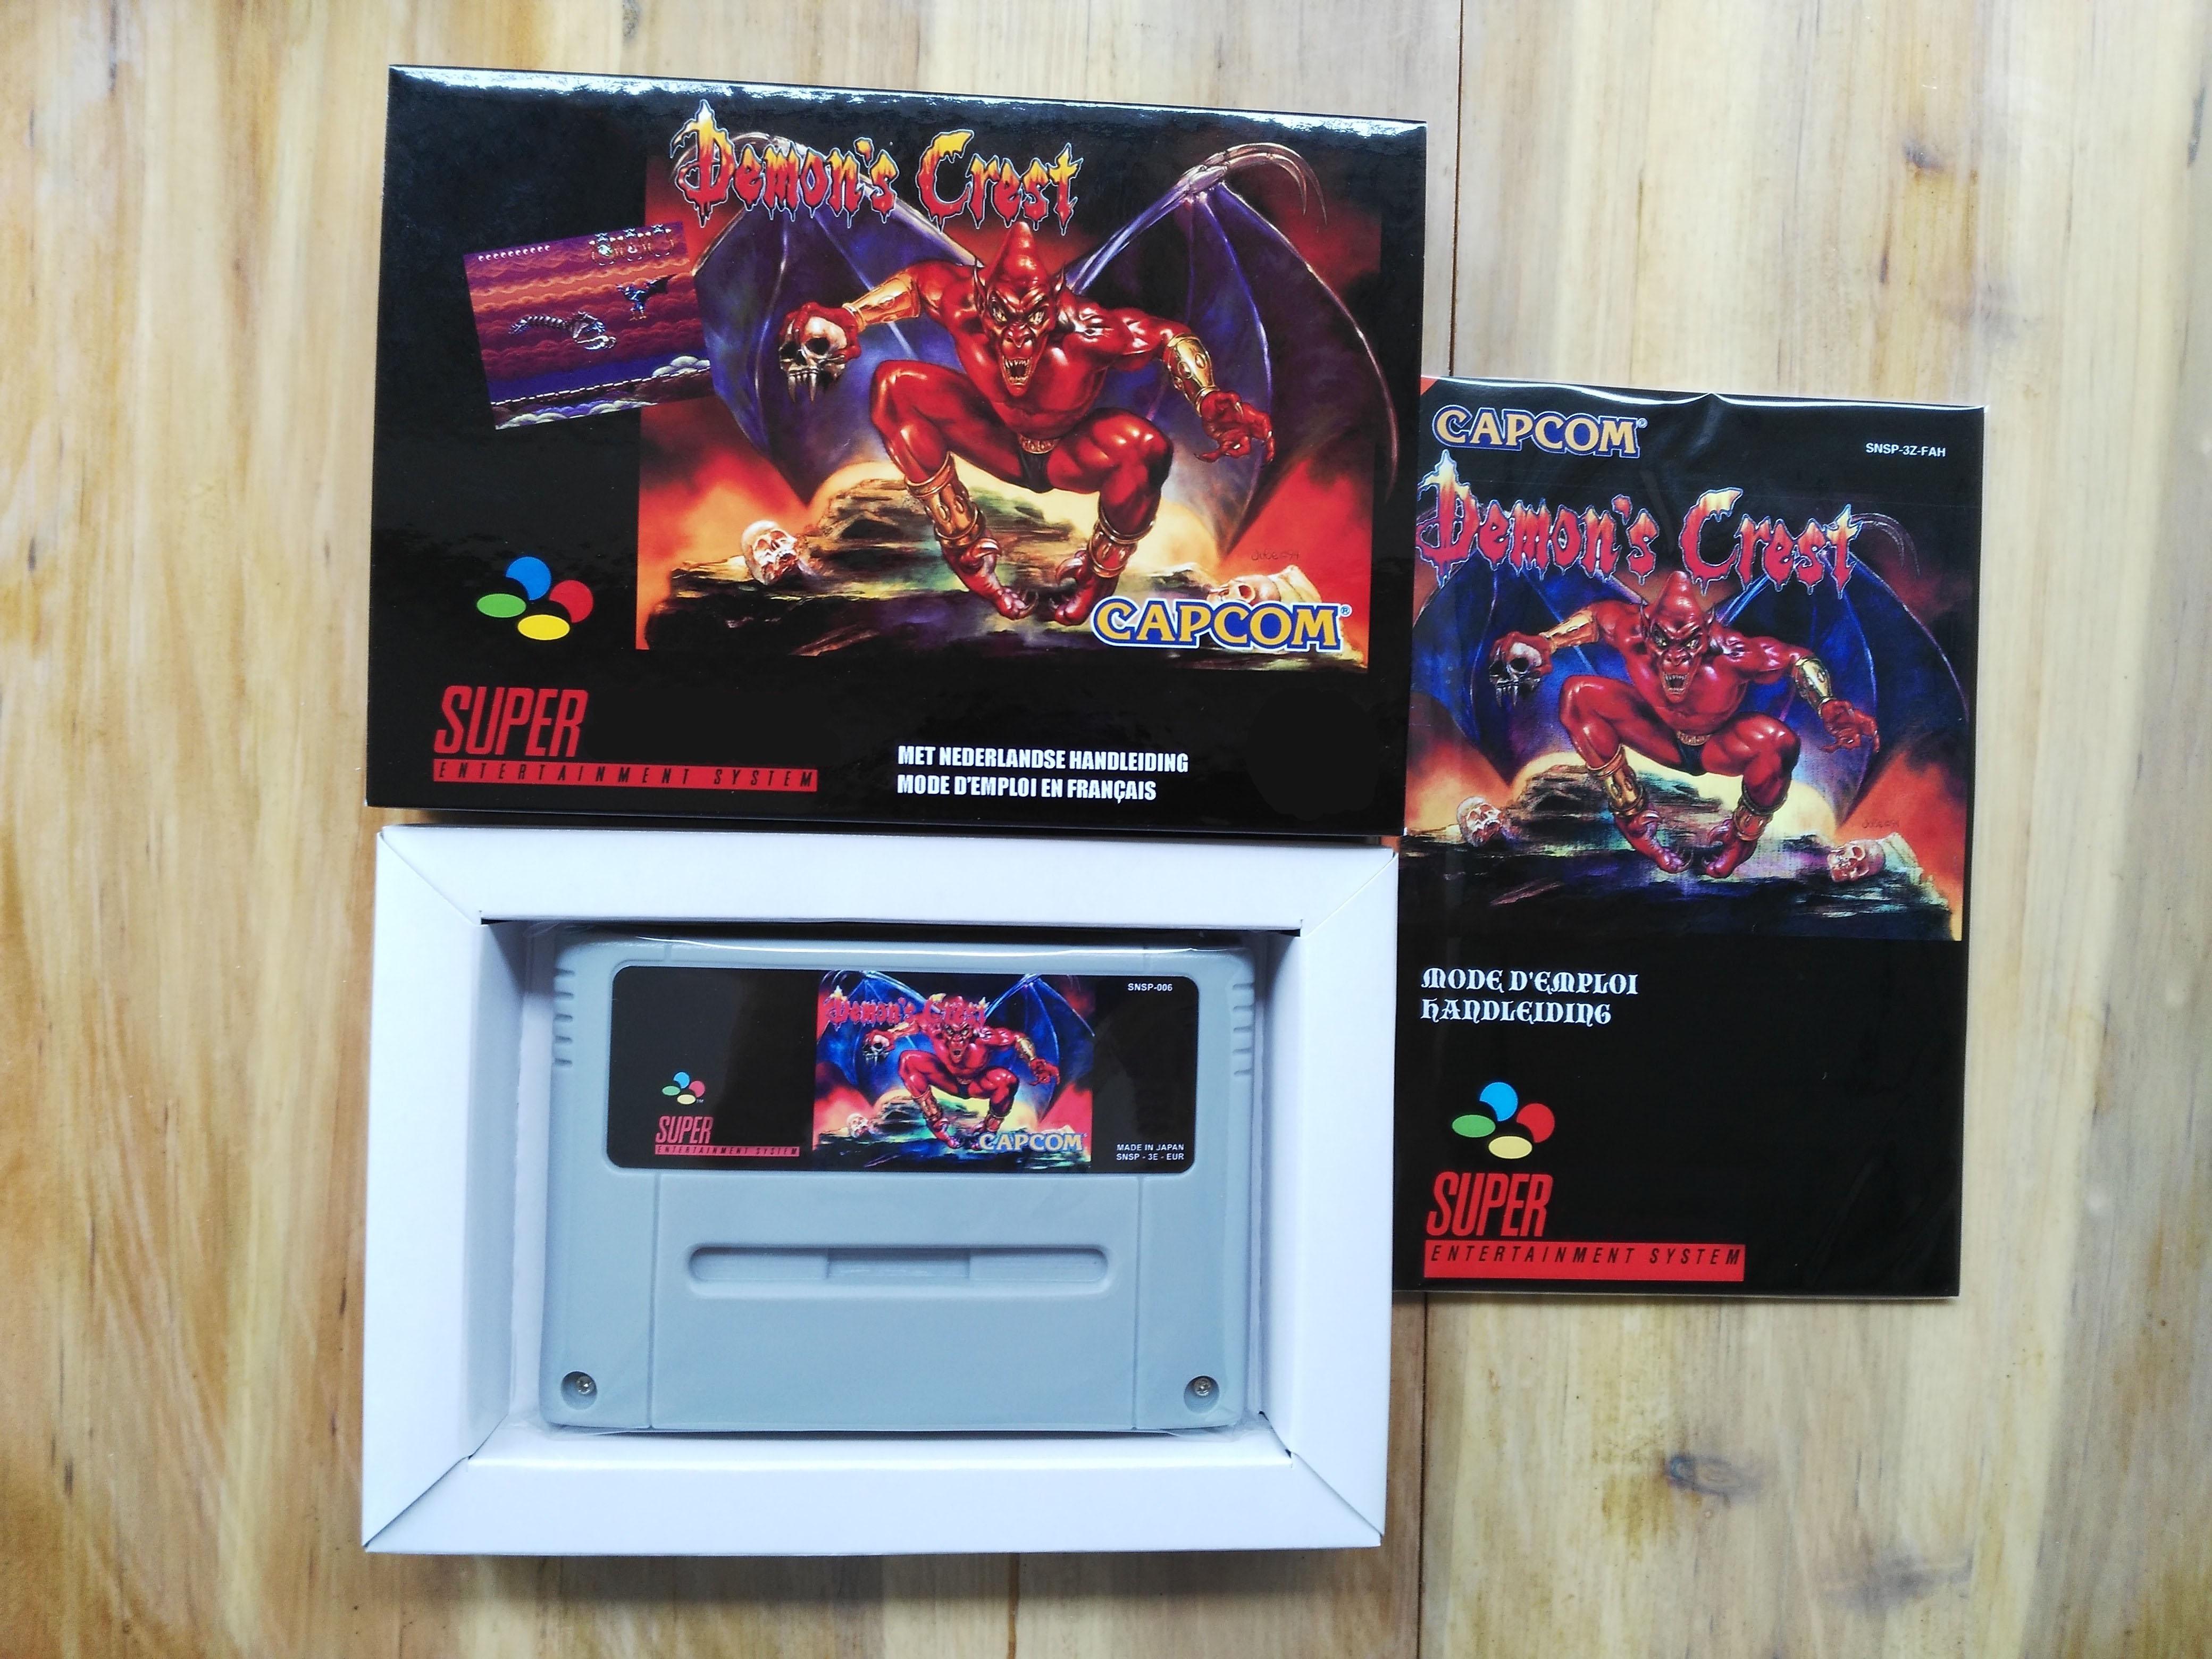 16Bit Games Demon s Crest French PAL Version Box Manual Cartridge